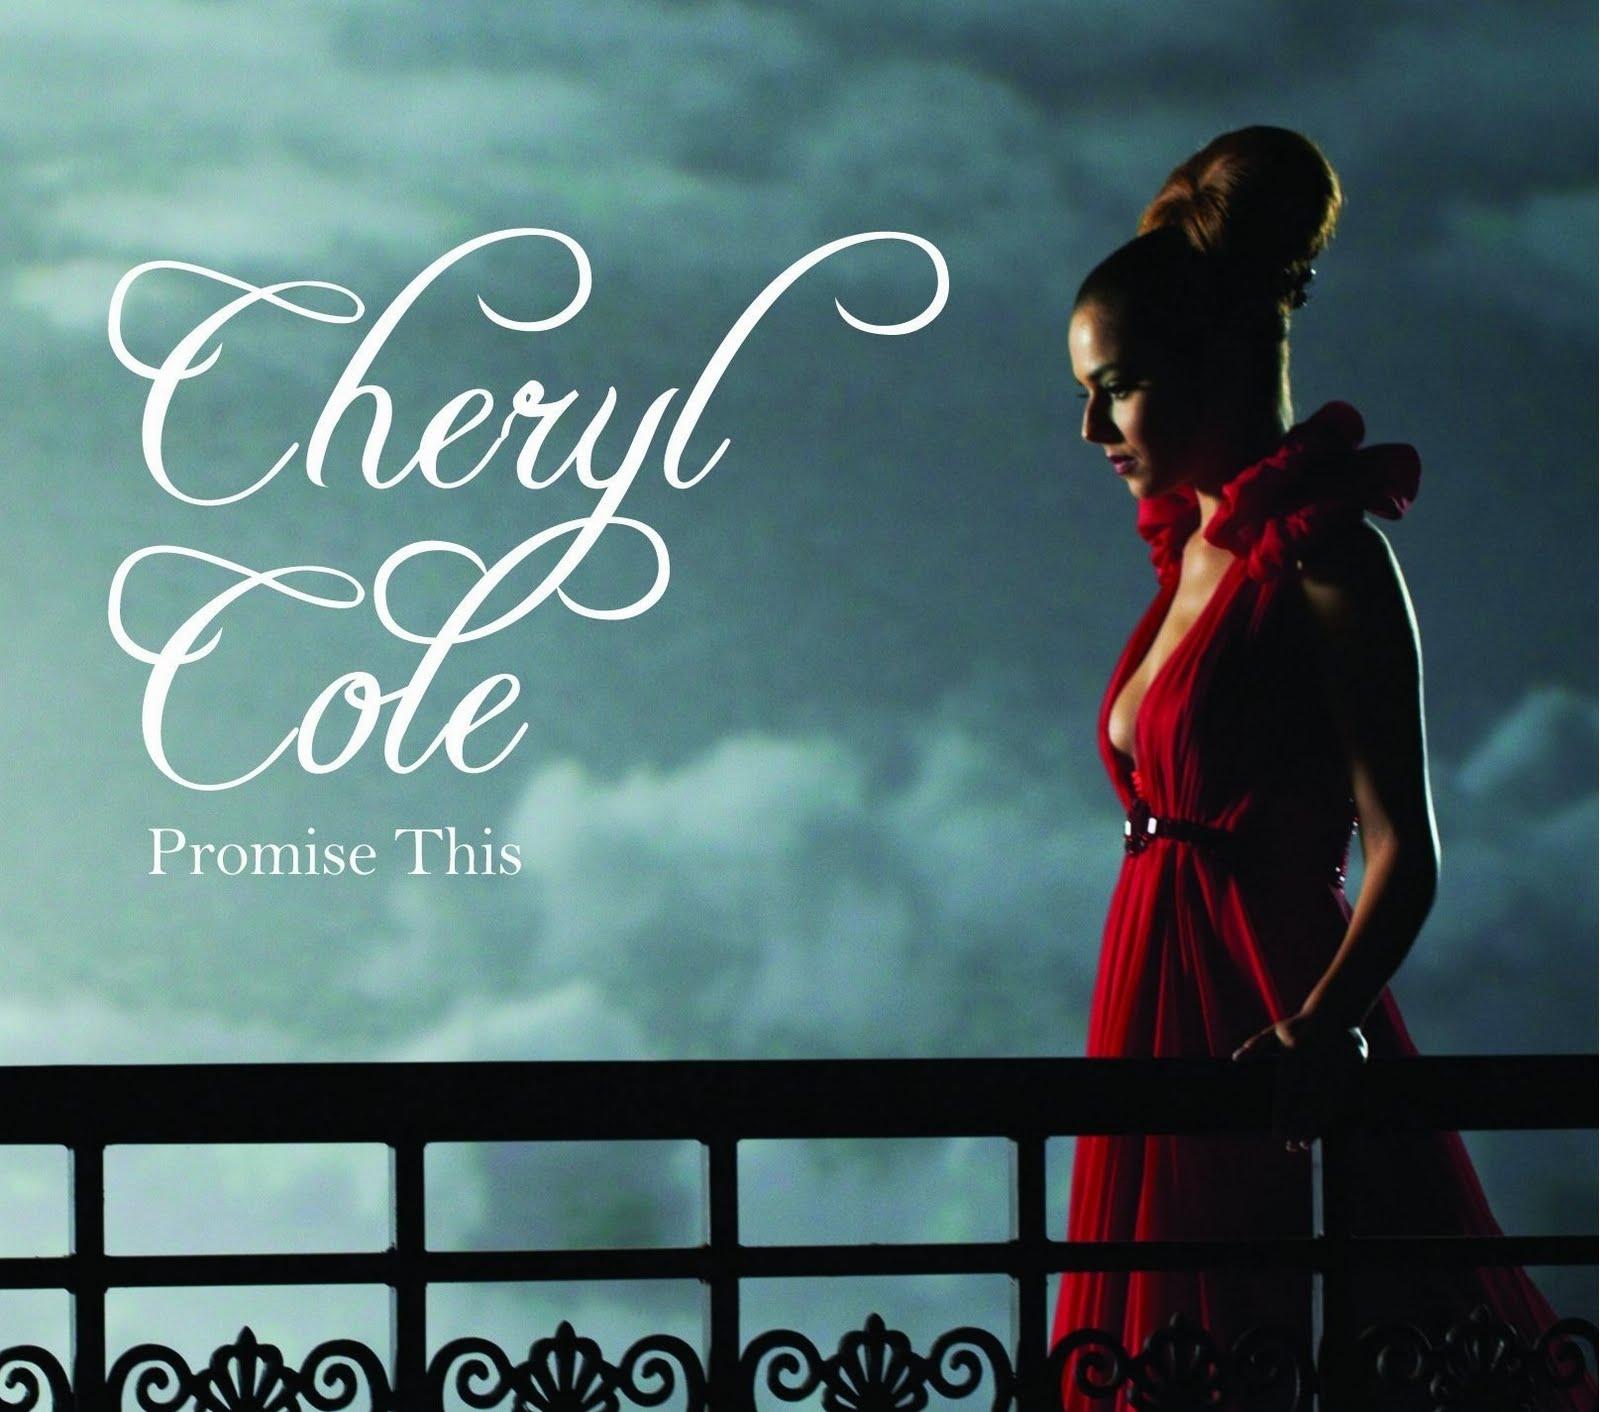 http://4.bp.blogspot.com/_bI5-8YnkkFA/TM1B3IEUfYI/AAAAAAAAE_w/guFRxtD-FhU/s1600/Cheryl+Cole+-+Promise+This.jpg